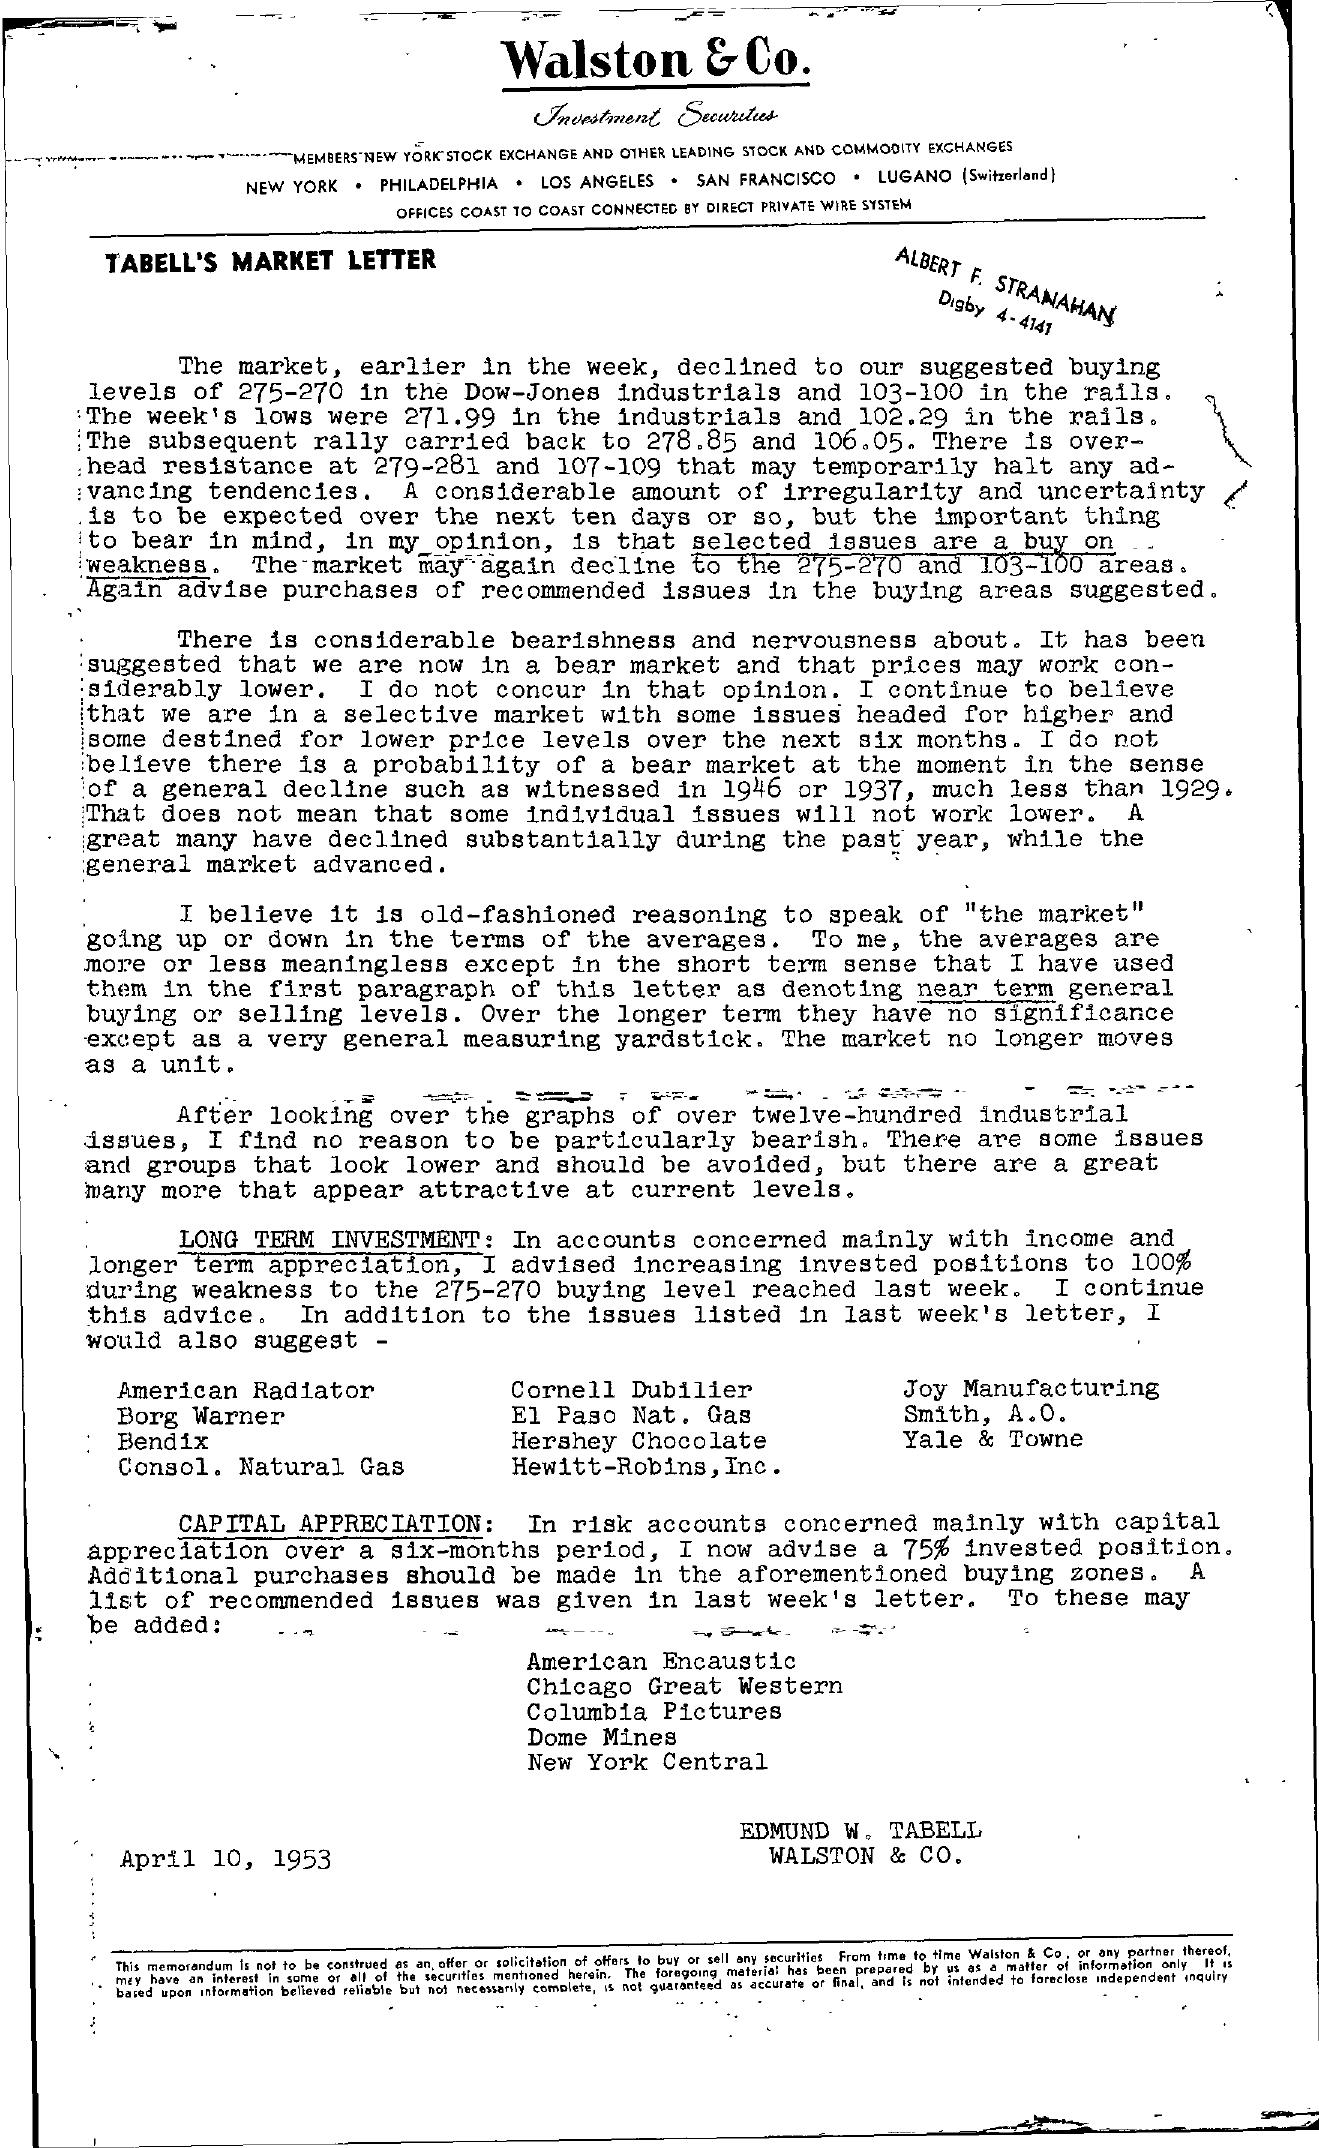 Tabell's Market Letter - April 10, 1953